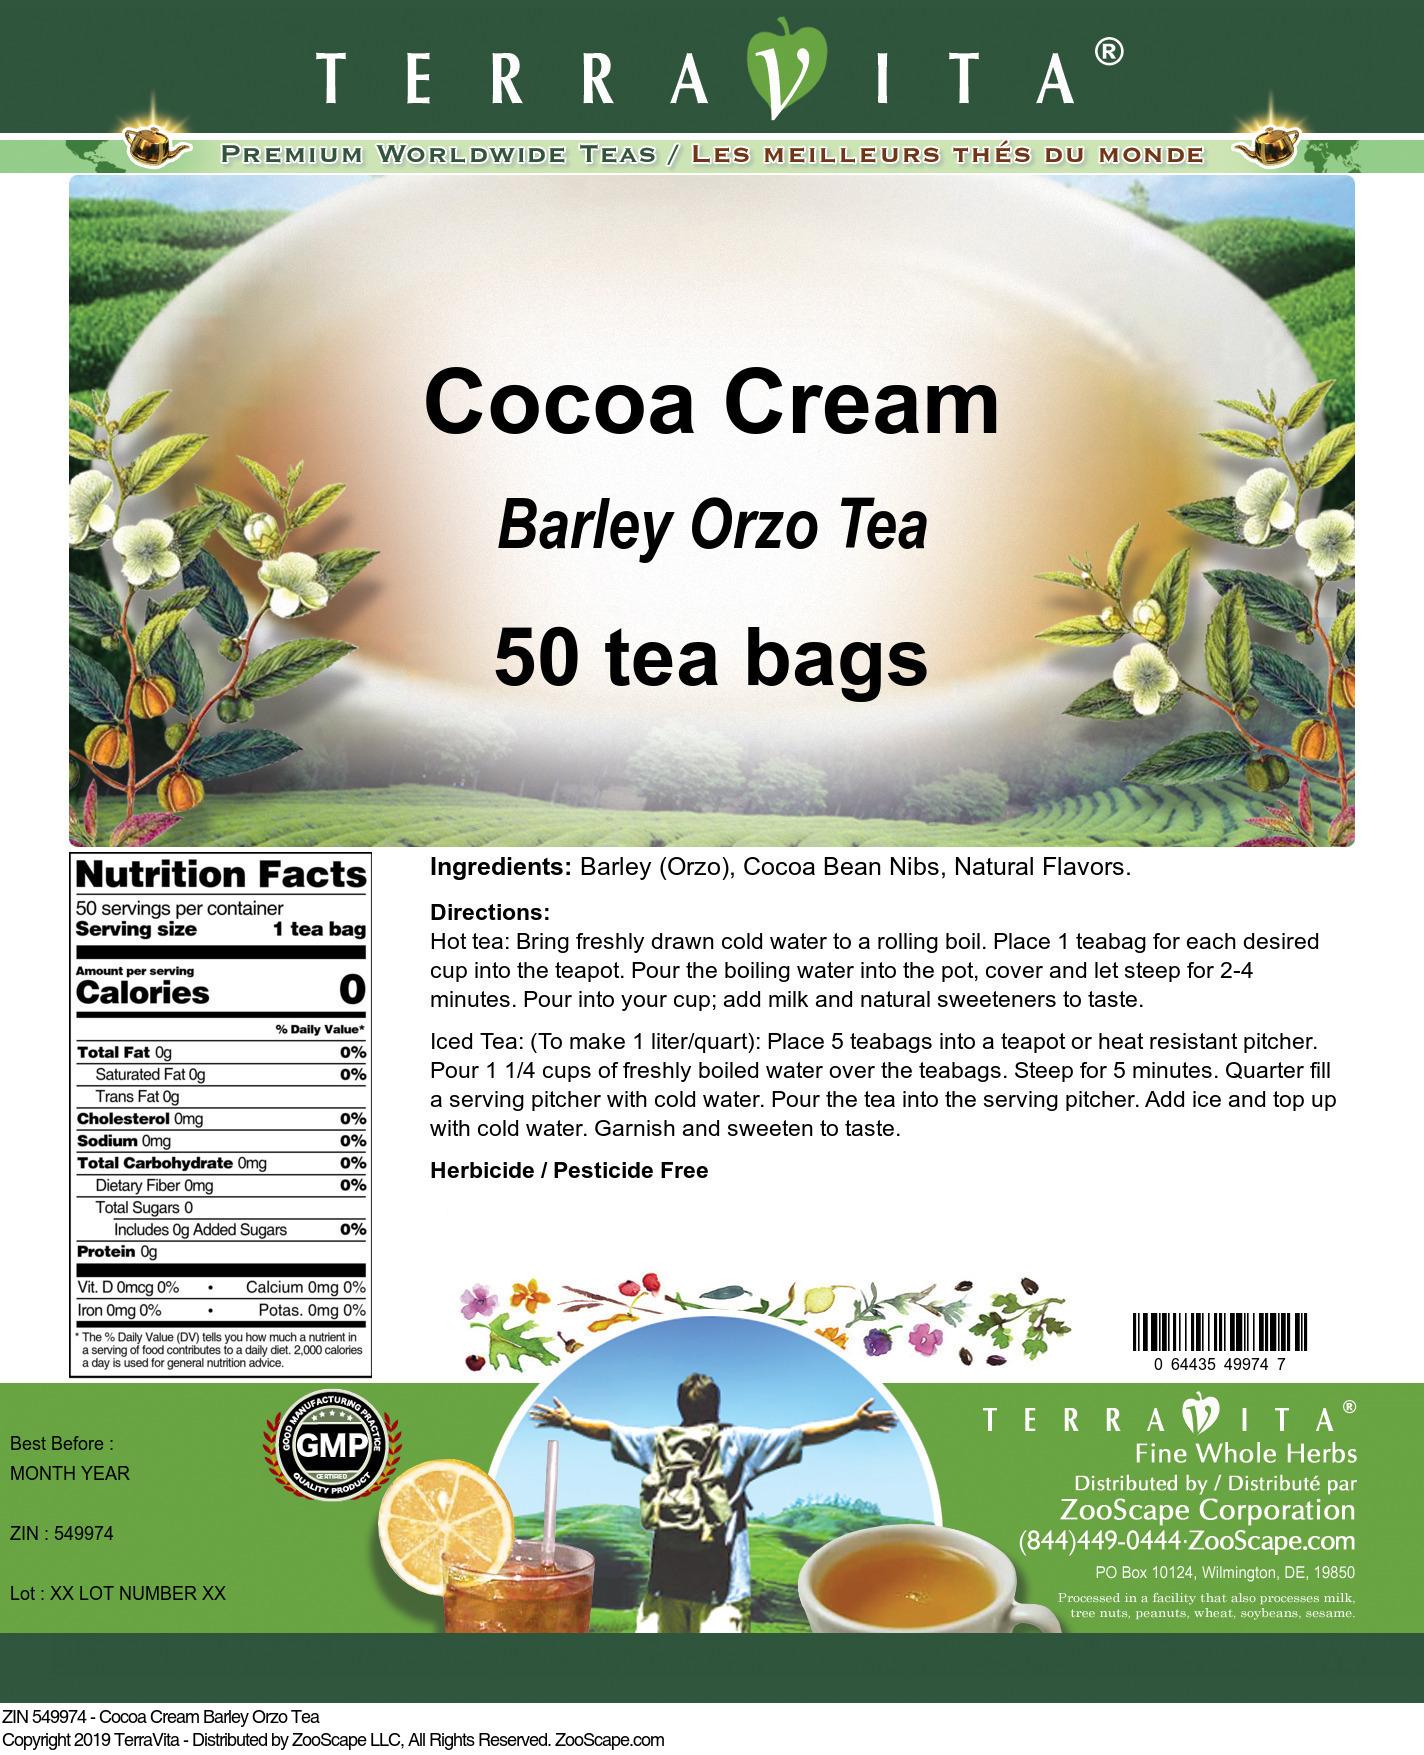 Cocoa Cream Barley Orzo